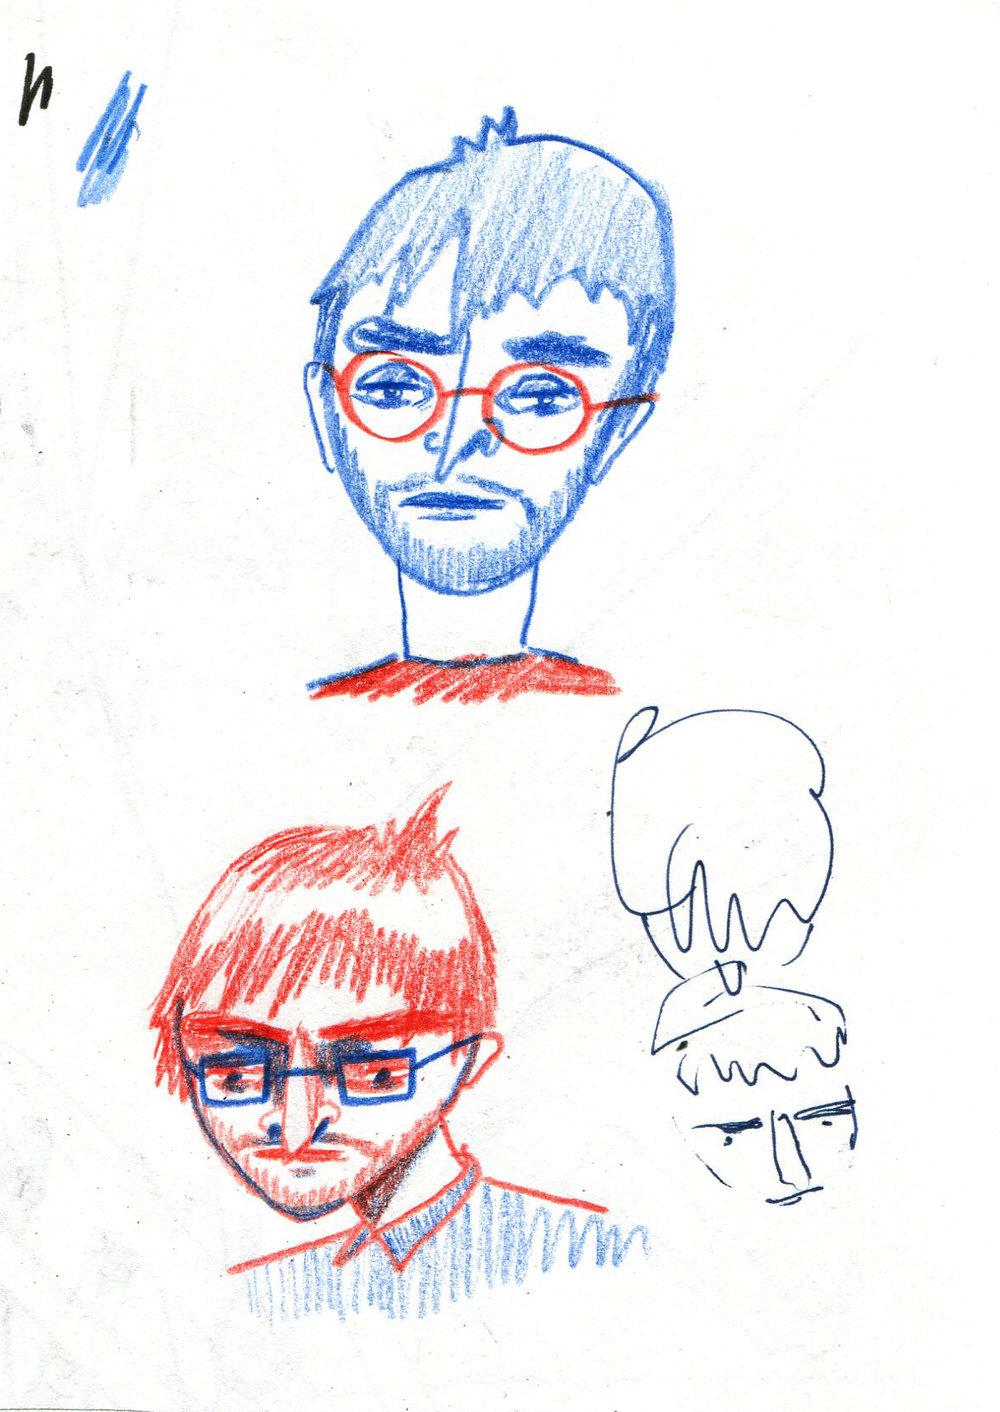 man face sketches 6.17.jpg